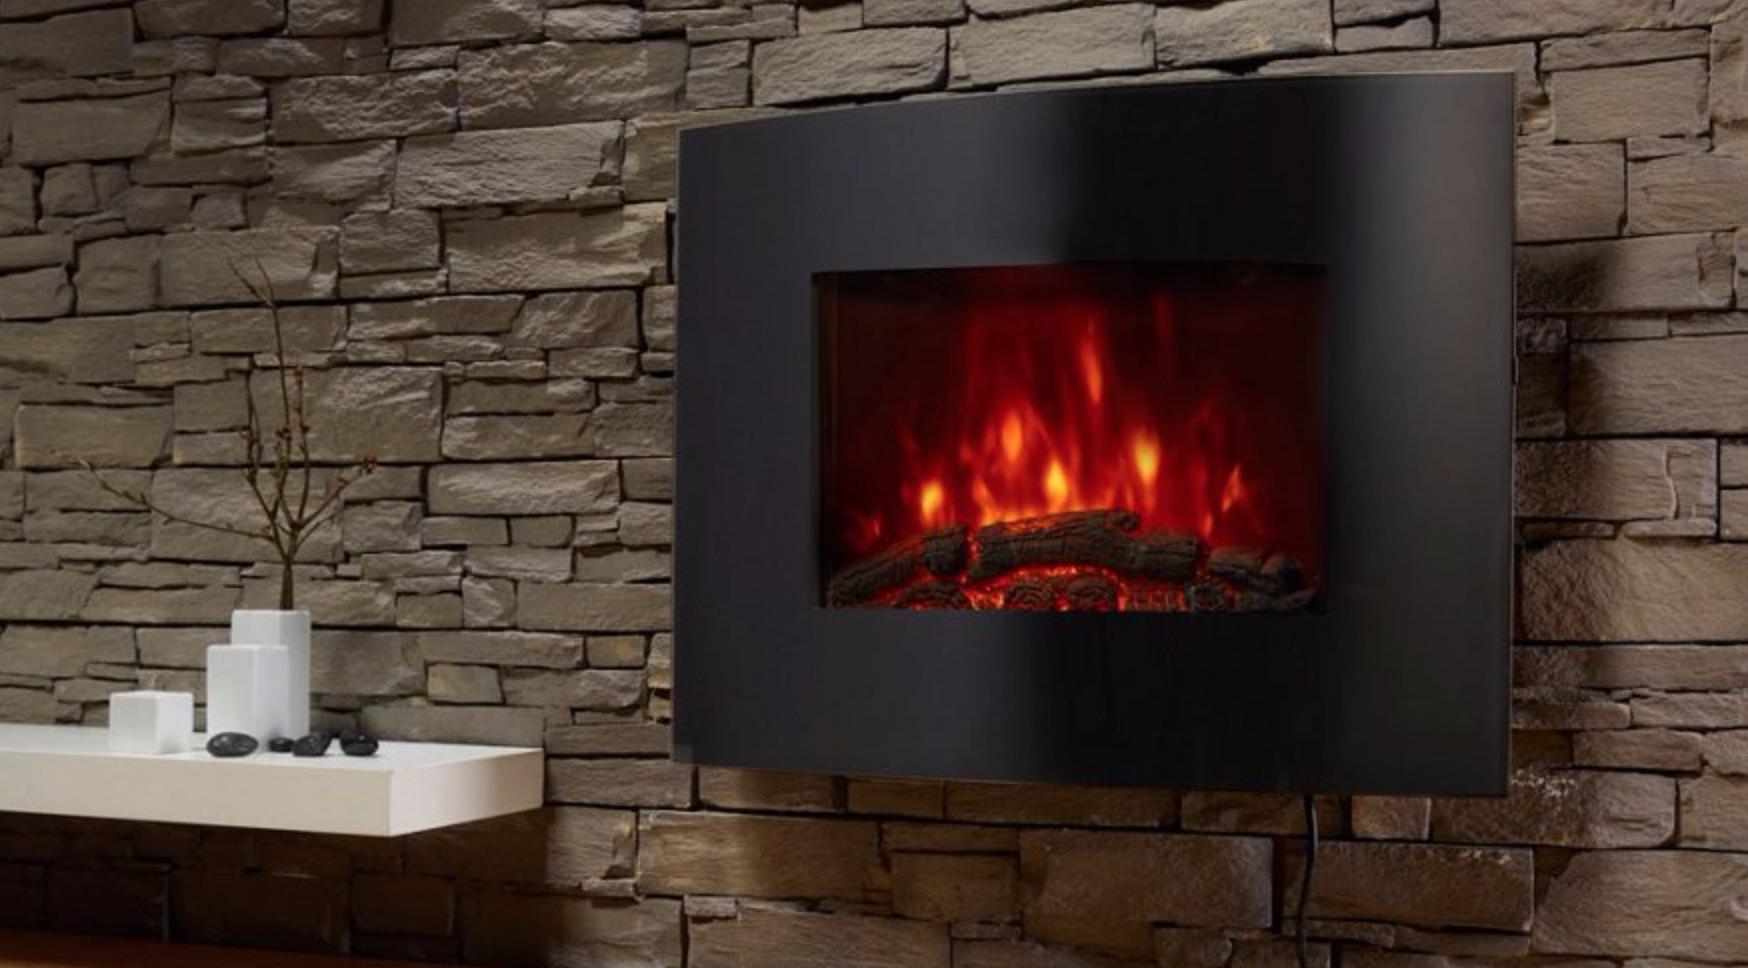 el fuego aarau elektrokamin mit heizfunktion und kaminfeuer effekt f r nur 74 39 euro. Black Bedroom Furniture Sets. Home Design Ideas